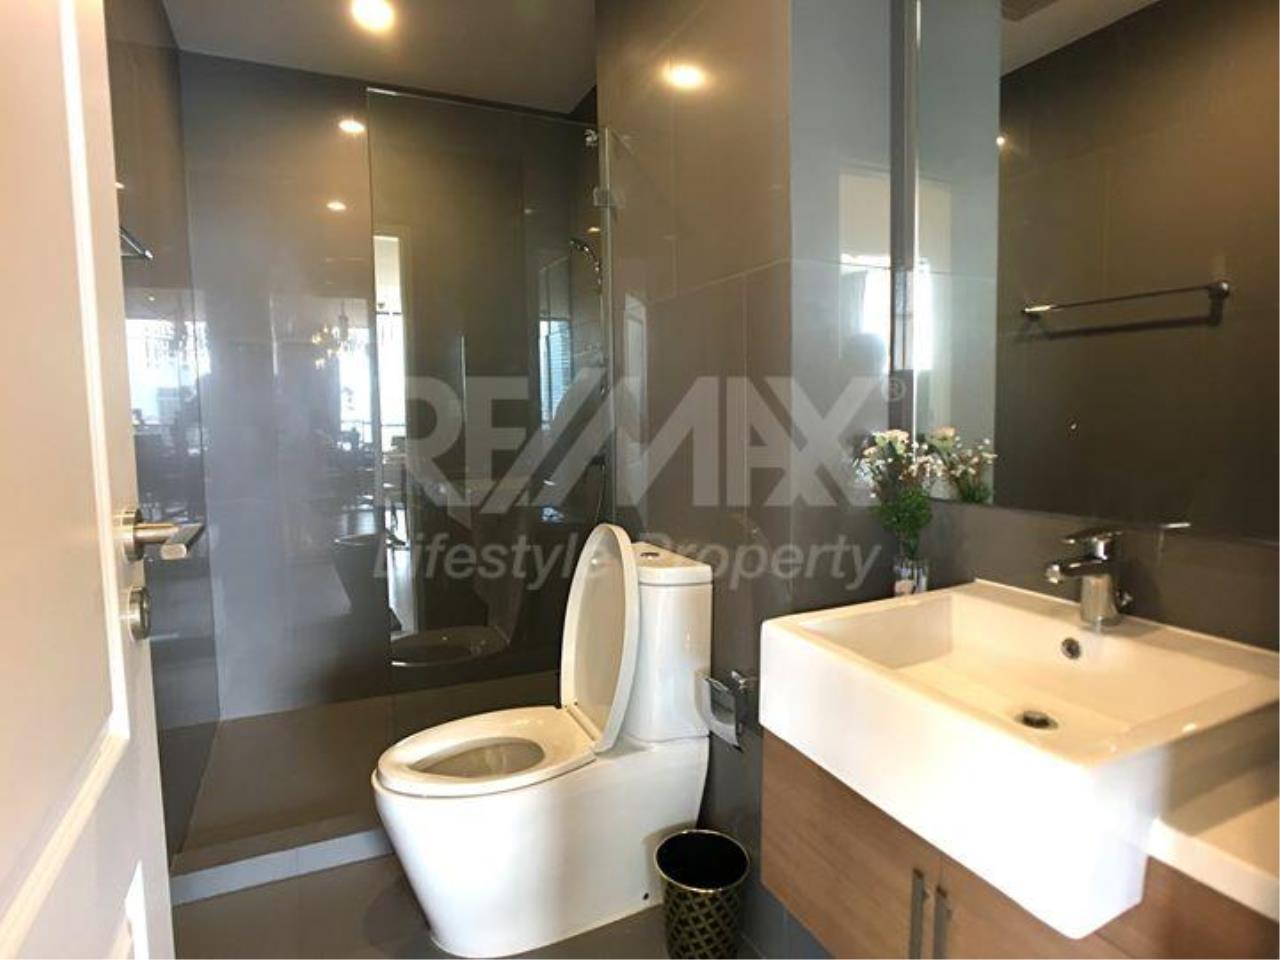 RE/MAX LifeStyle Property Agency's Noble Revo Silom 9